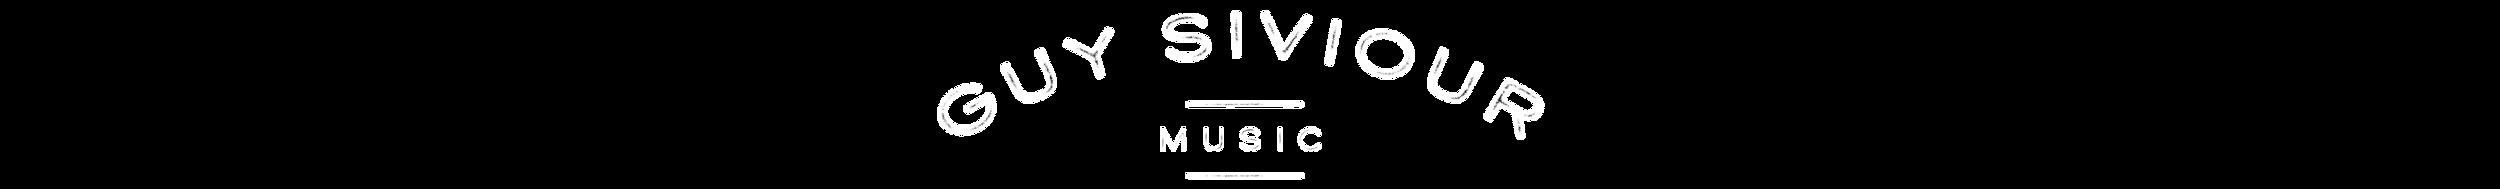 Guy Siviour Music